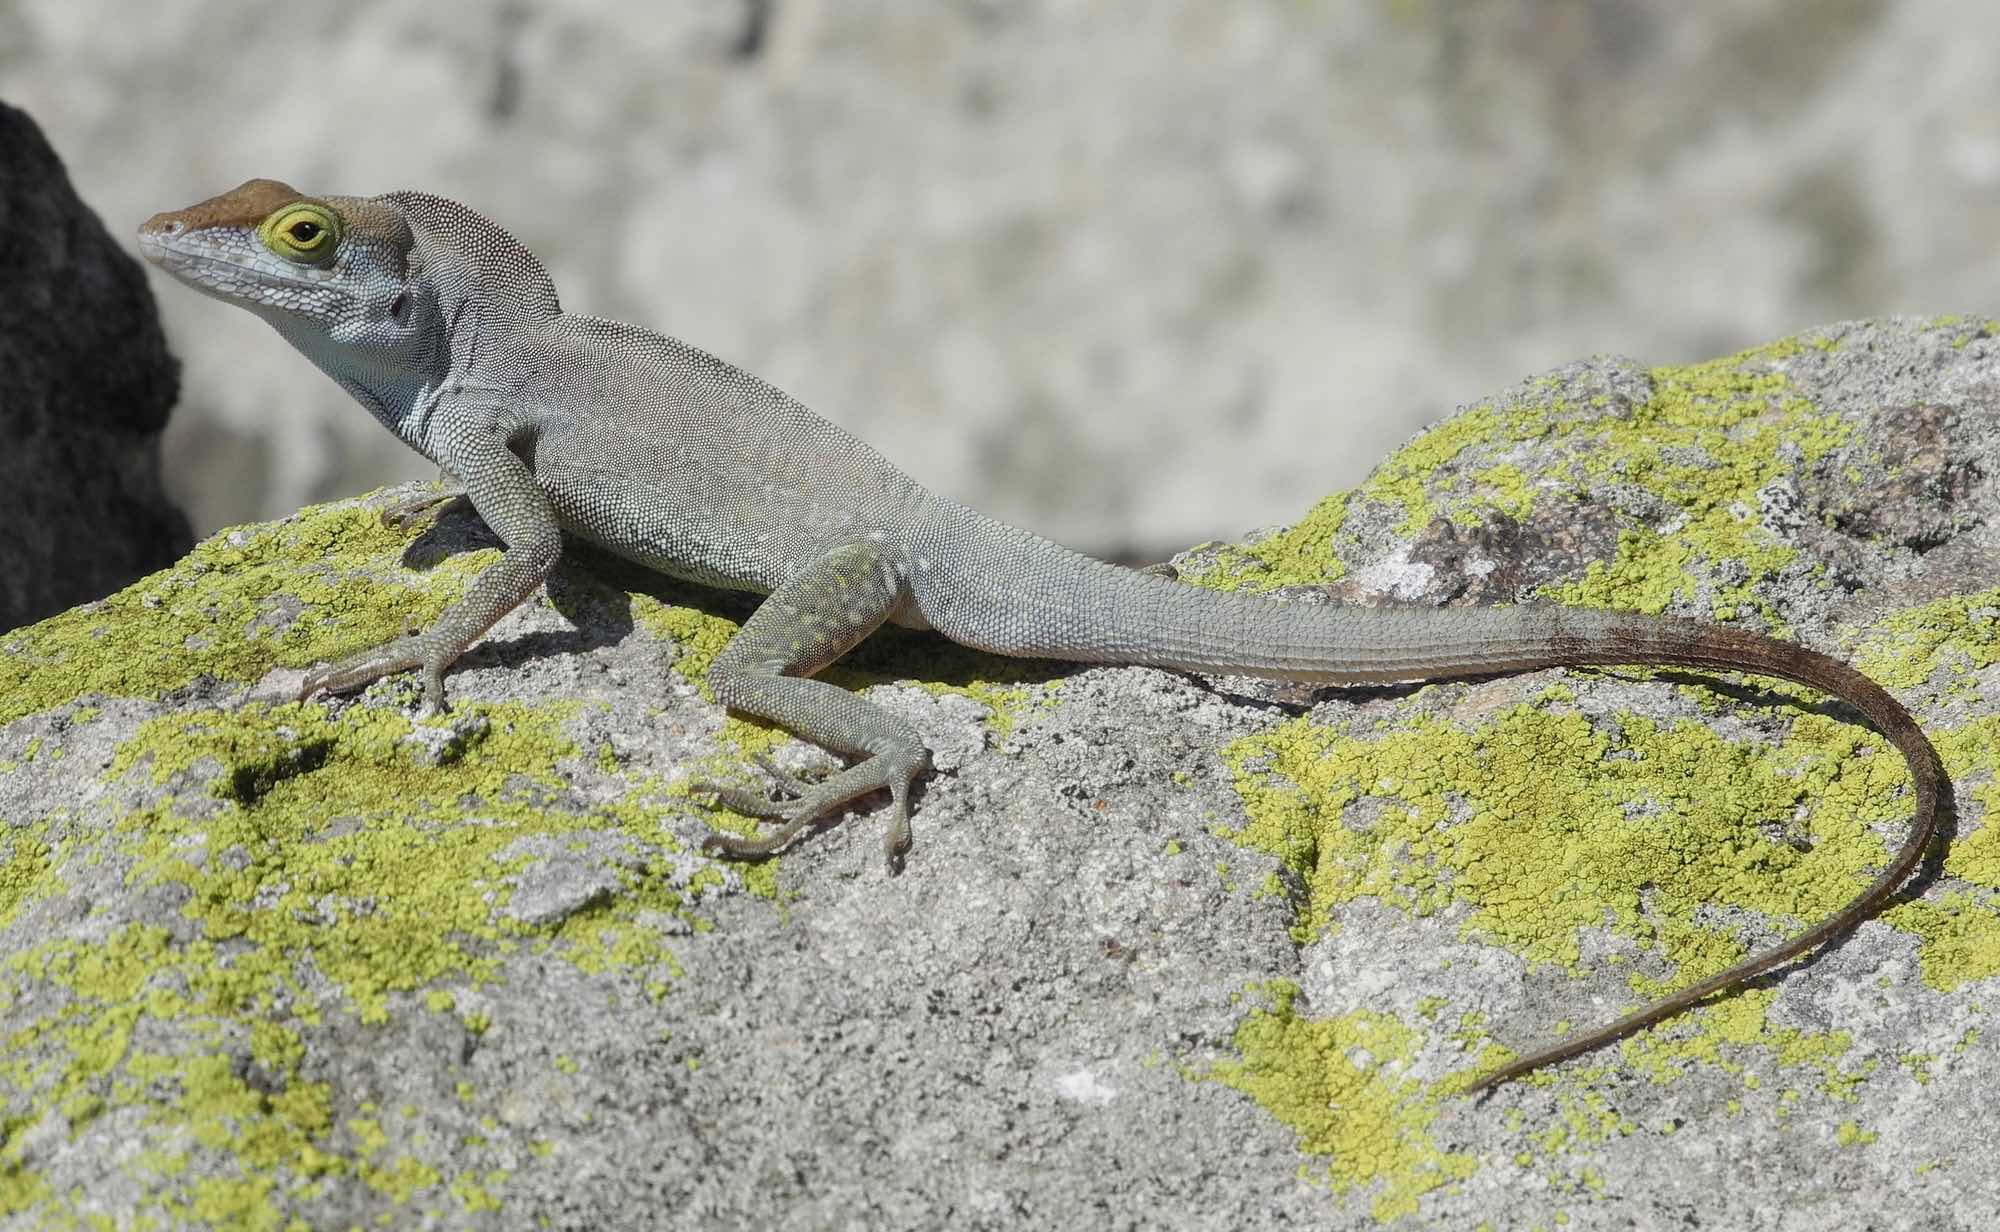 Redonda tree lizard (Anolis nubilus), also found on Redonda Island only. Photo by Jenny Daltry/Fauna & Flora International.